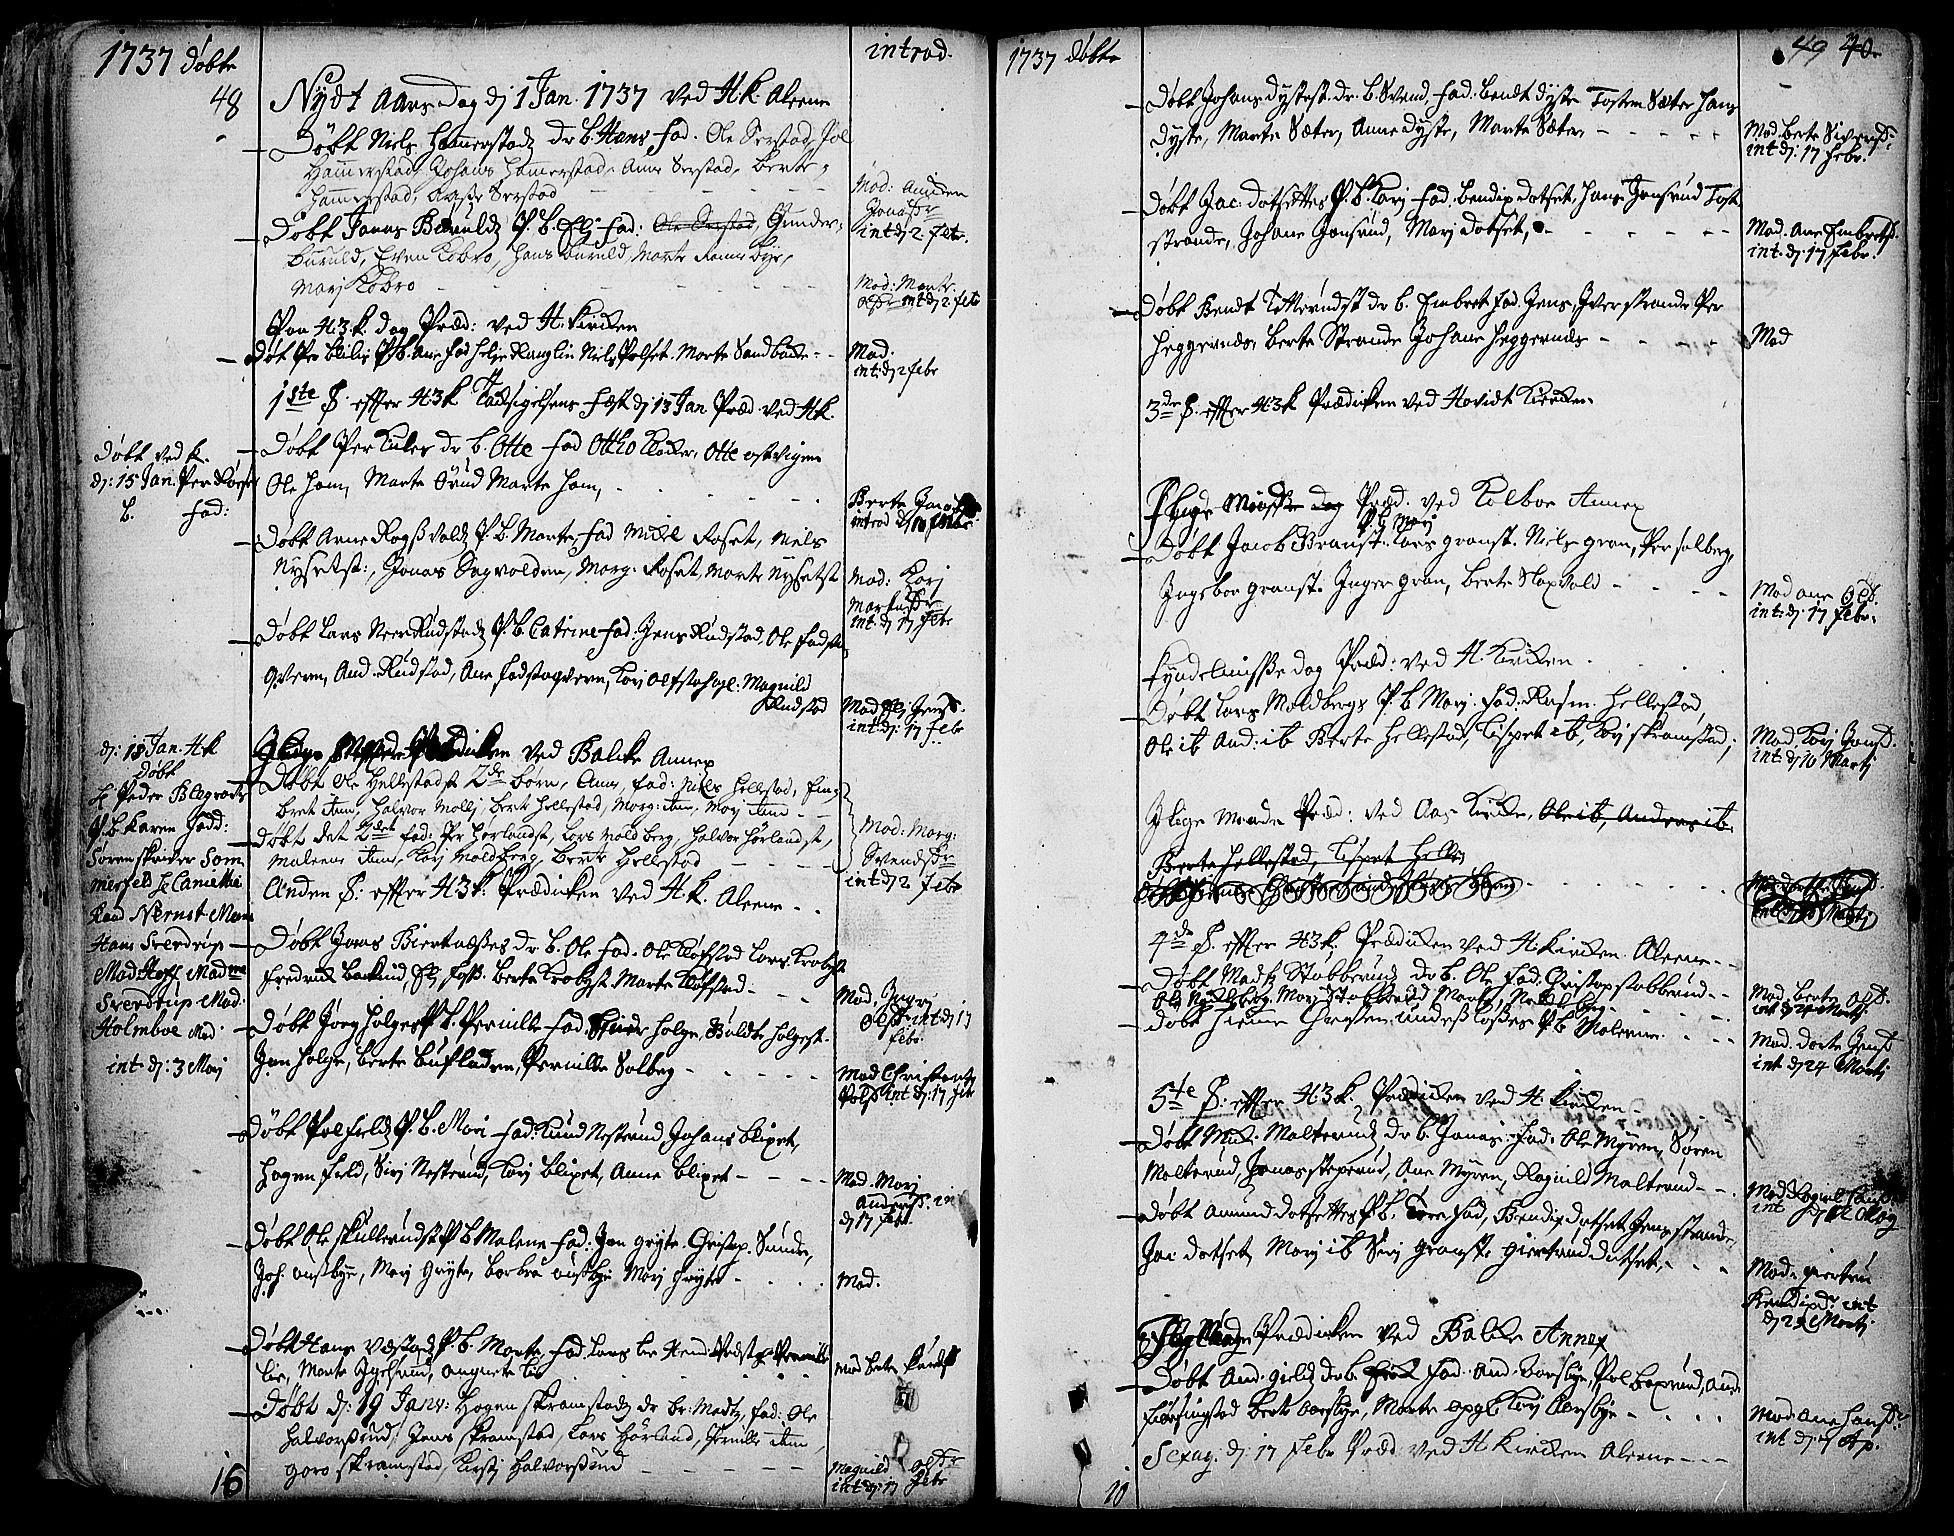 SAH, Toten prestekontor, Ministerialbok nr. 3, 1734-1751, s. 48-49